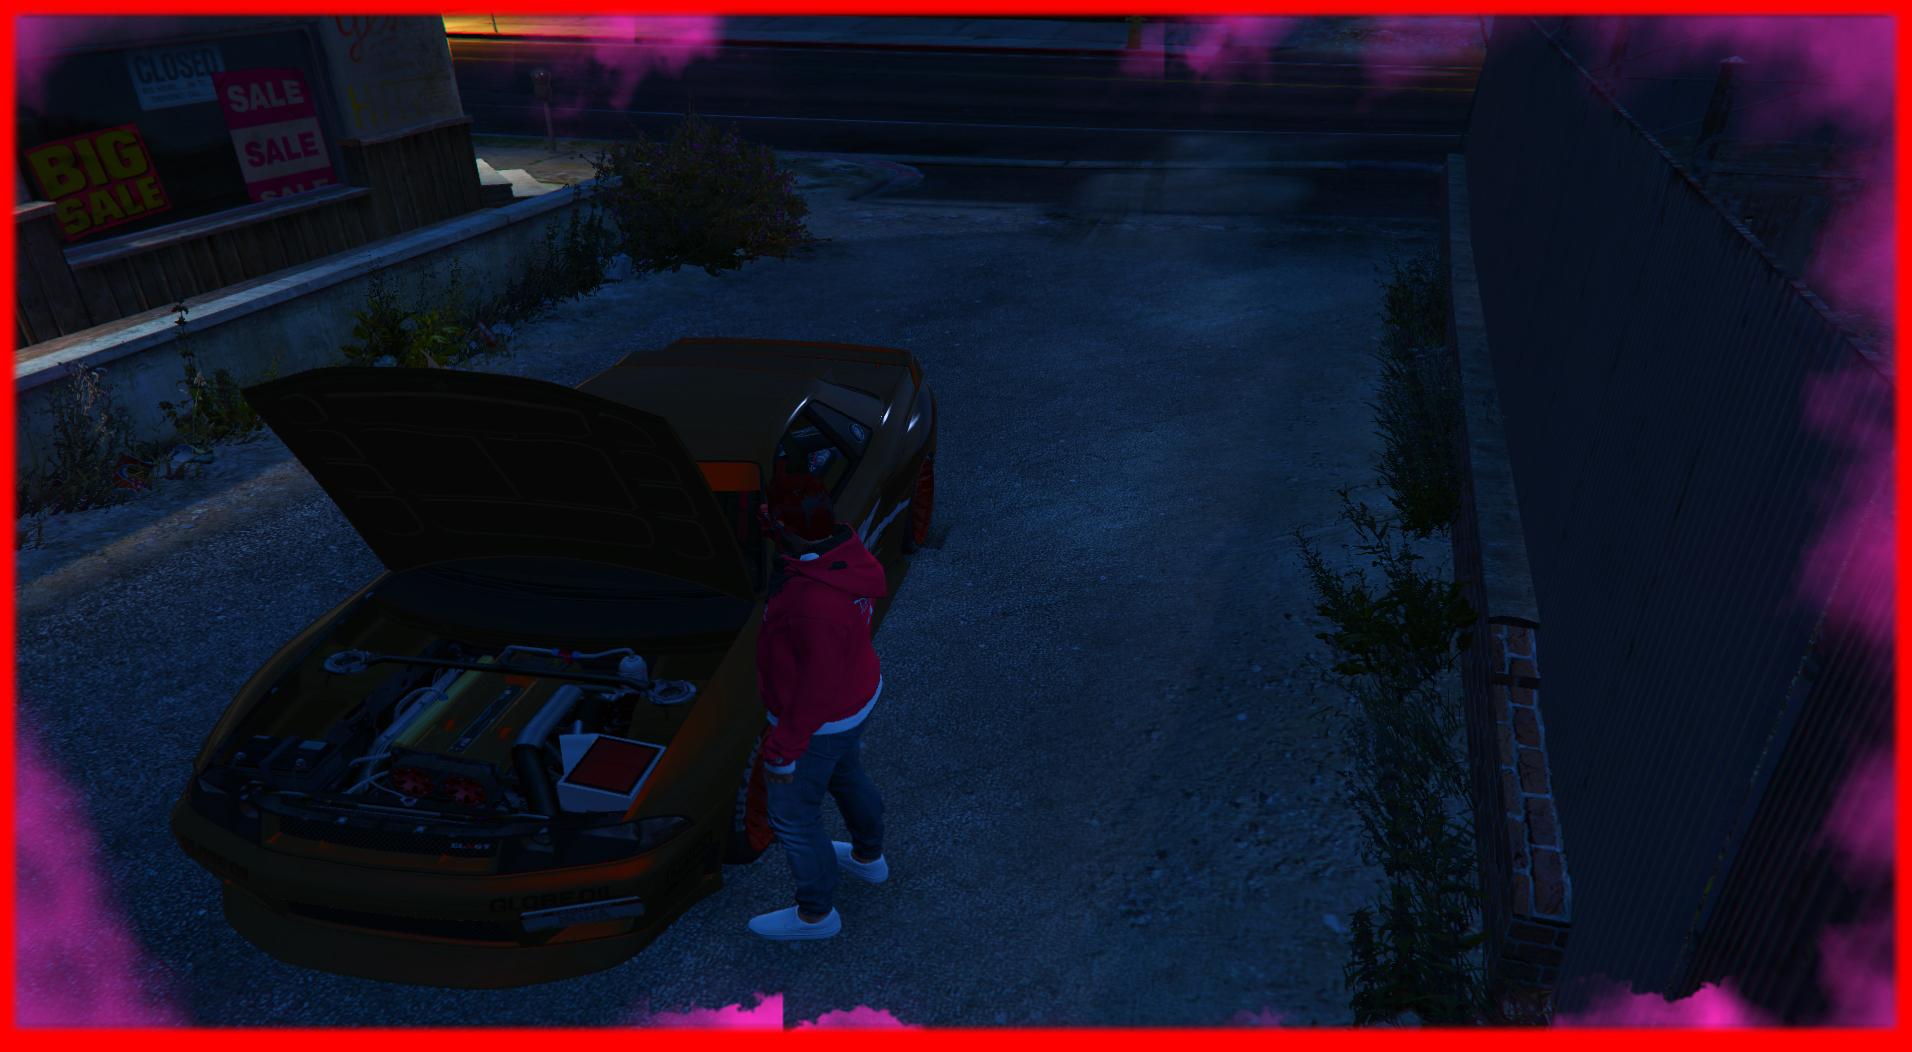 Grand_Theft_Auto_V_Screenshot_2021.02.26_-_19.18.jpg